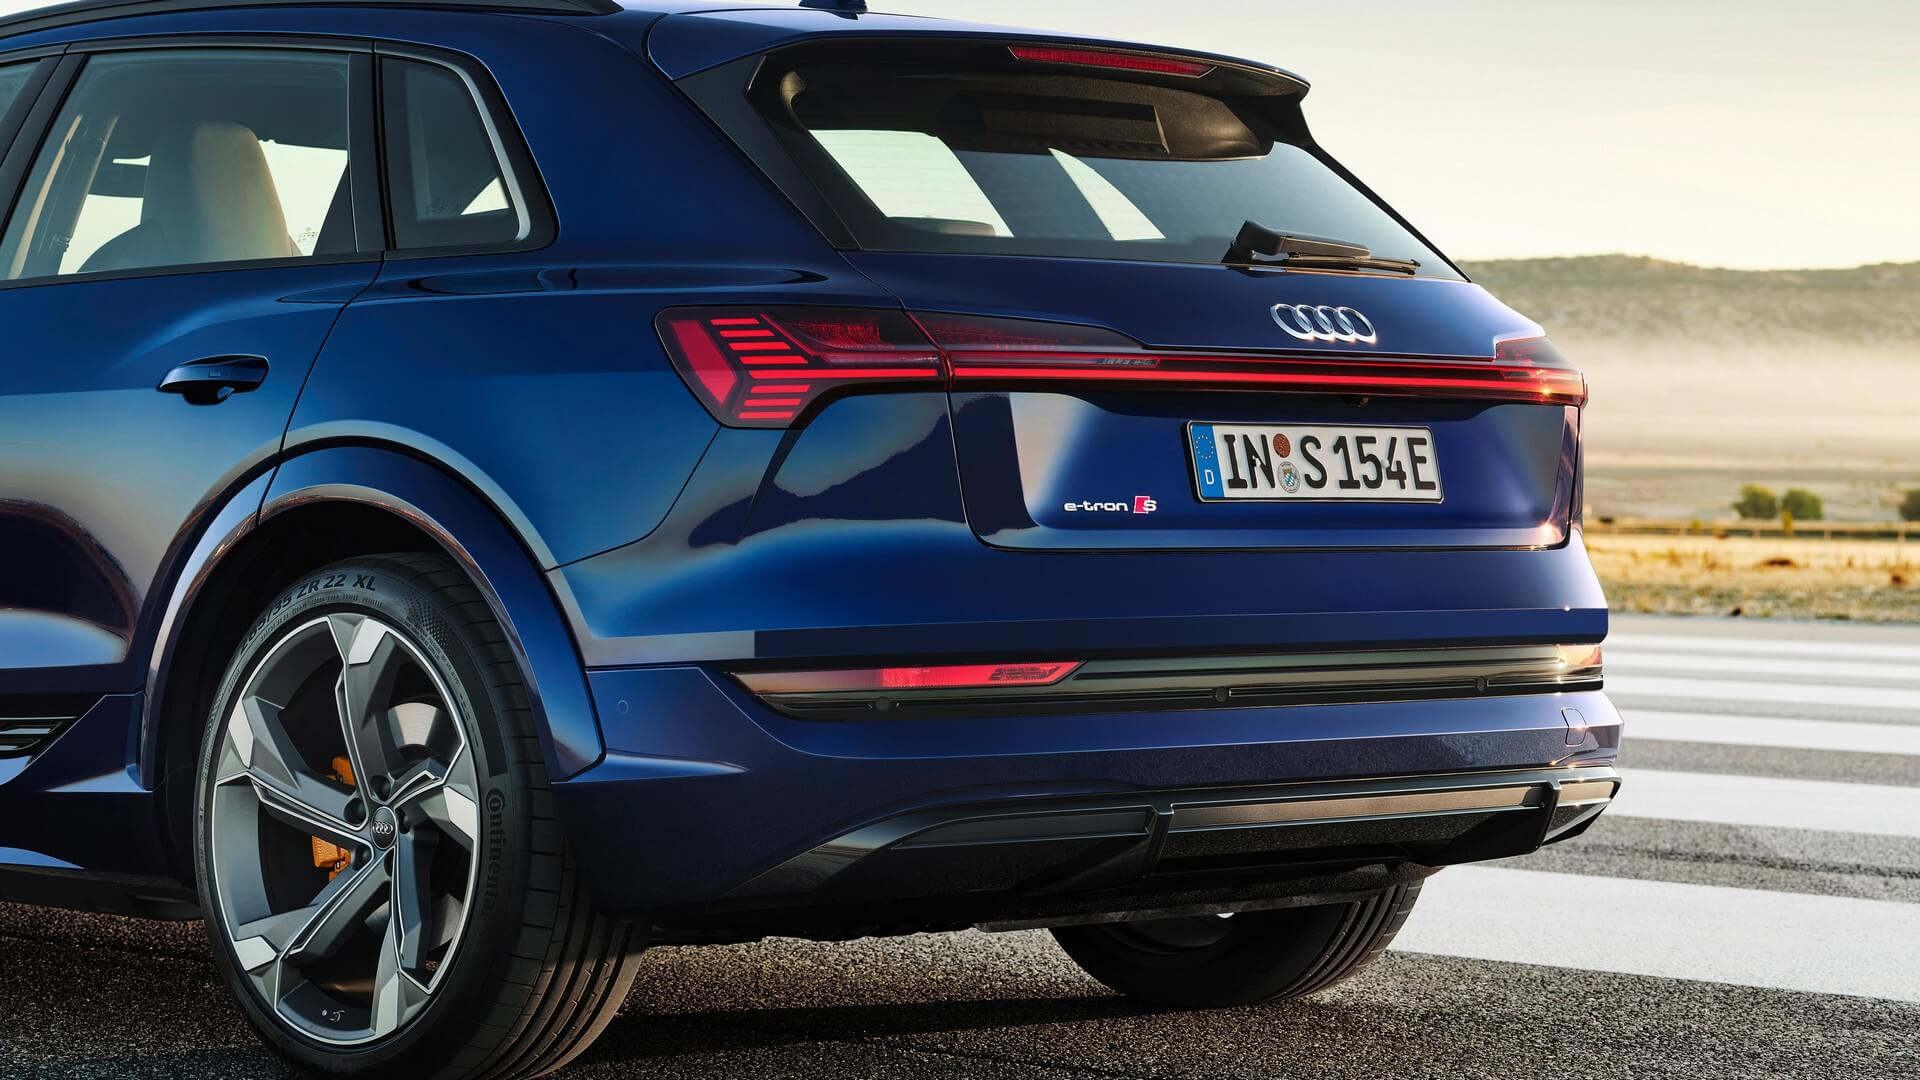 Audi-E-Tron-S-and-E-Tron-S-Sportback-2020-40